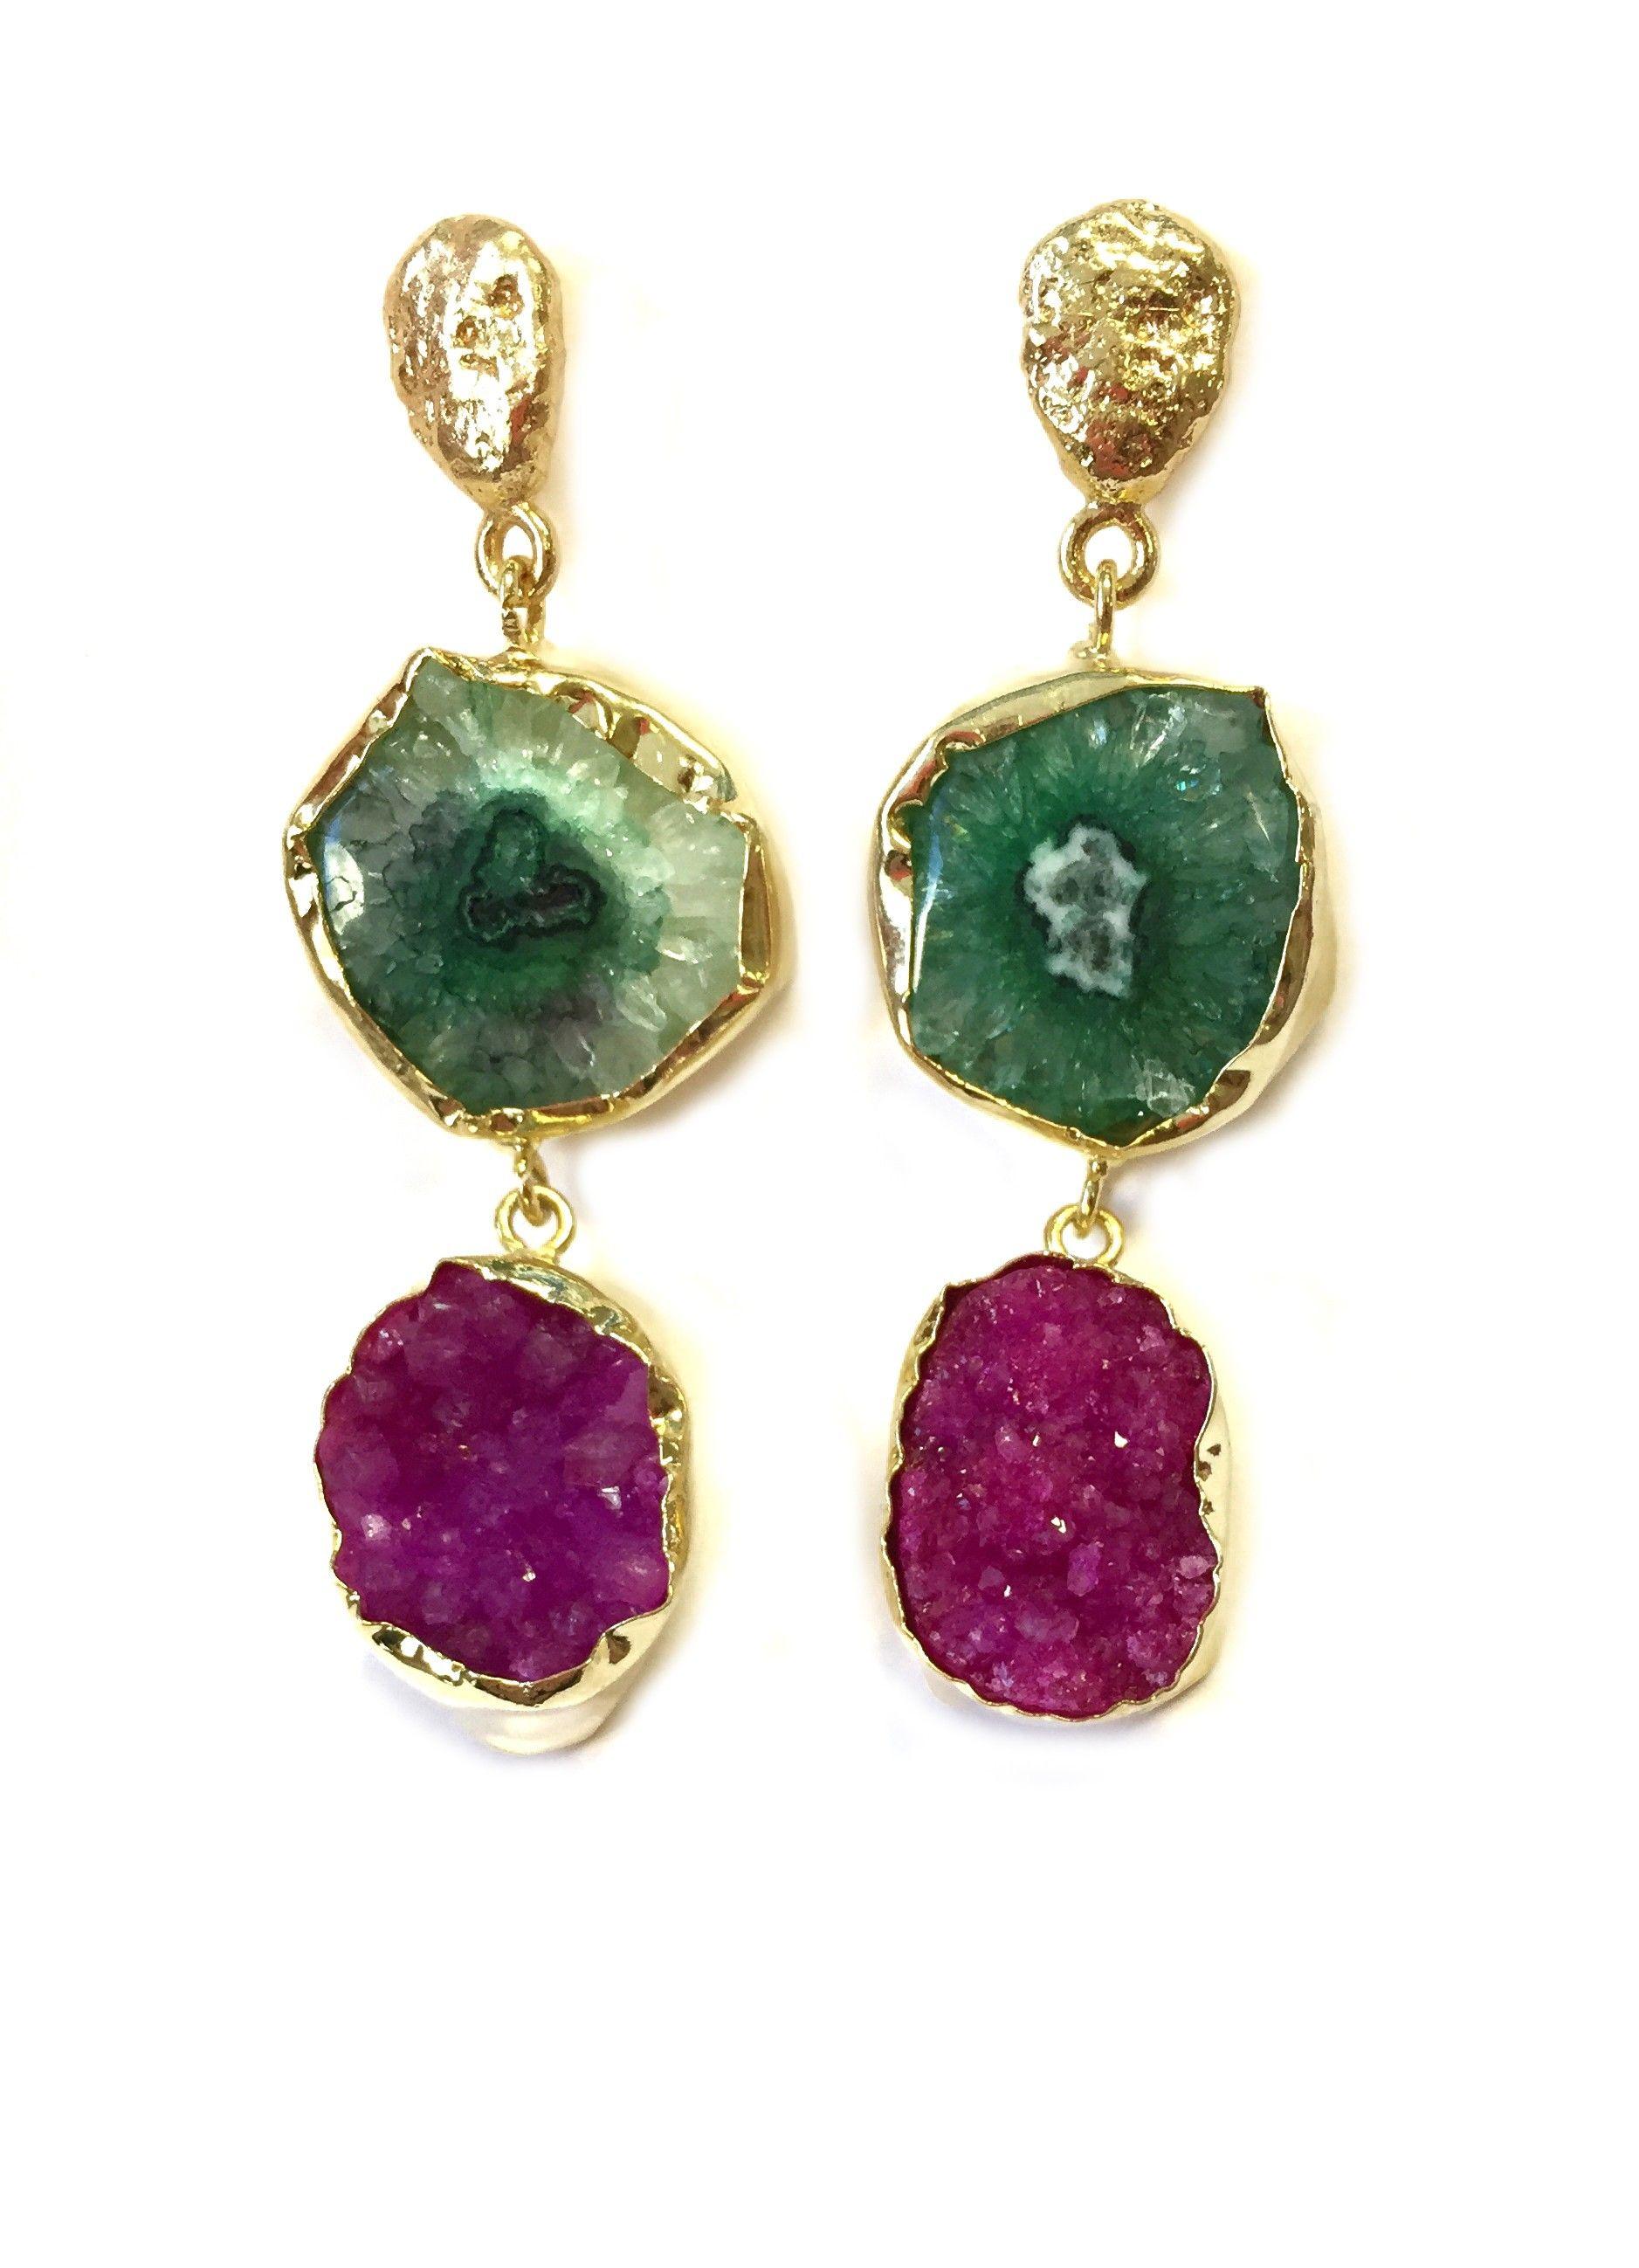 de83764a0f55 Jewelcloning - Pendientes Lavani Verde y Fucsia